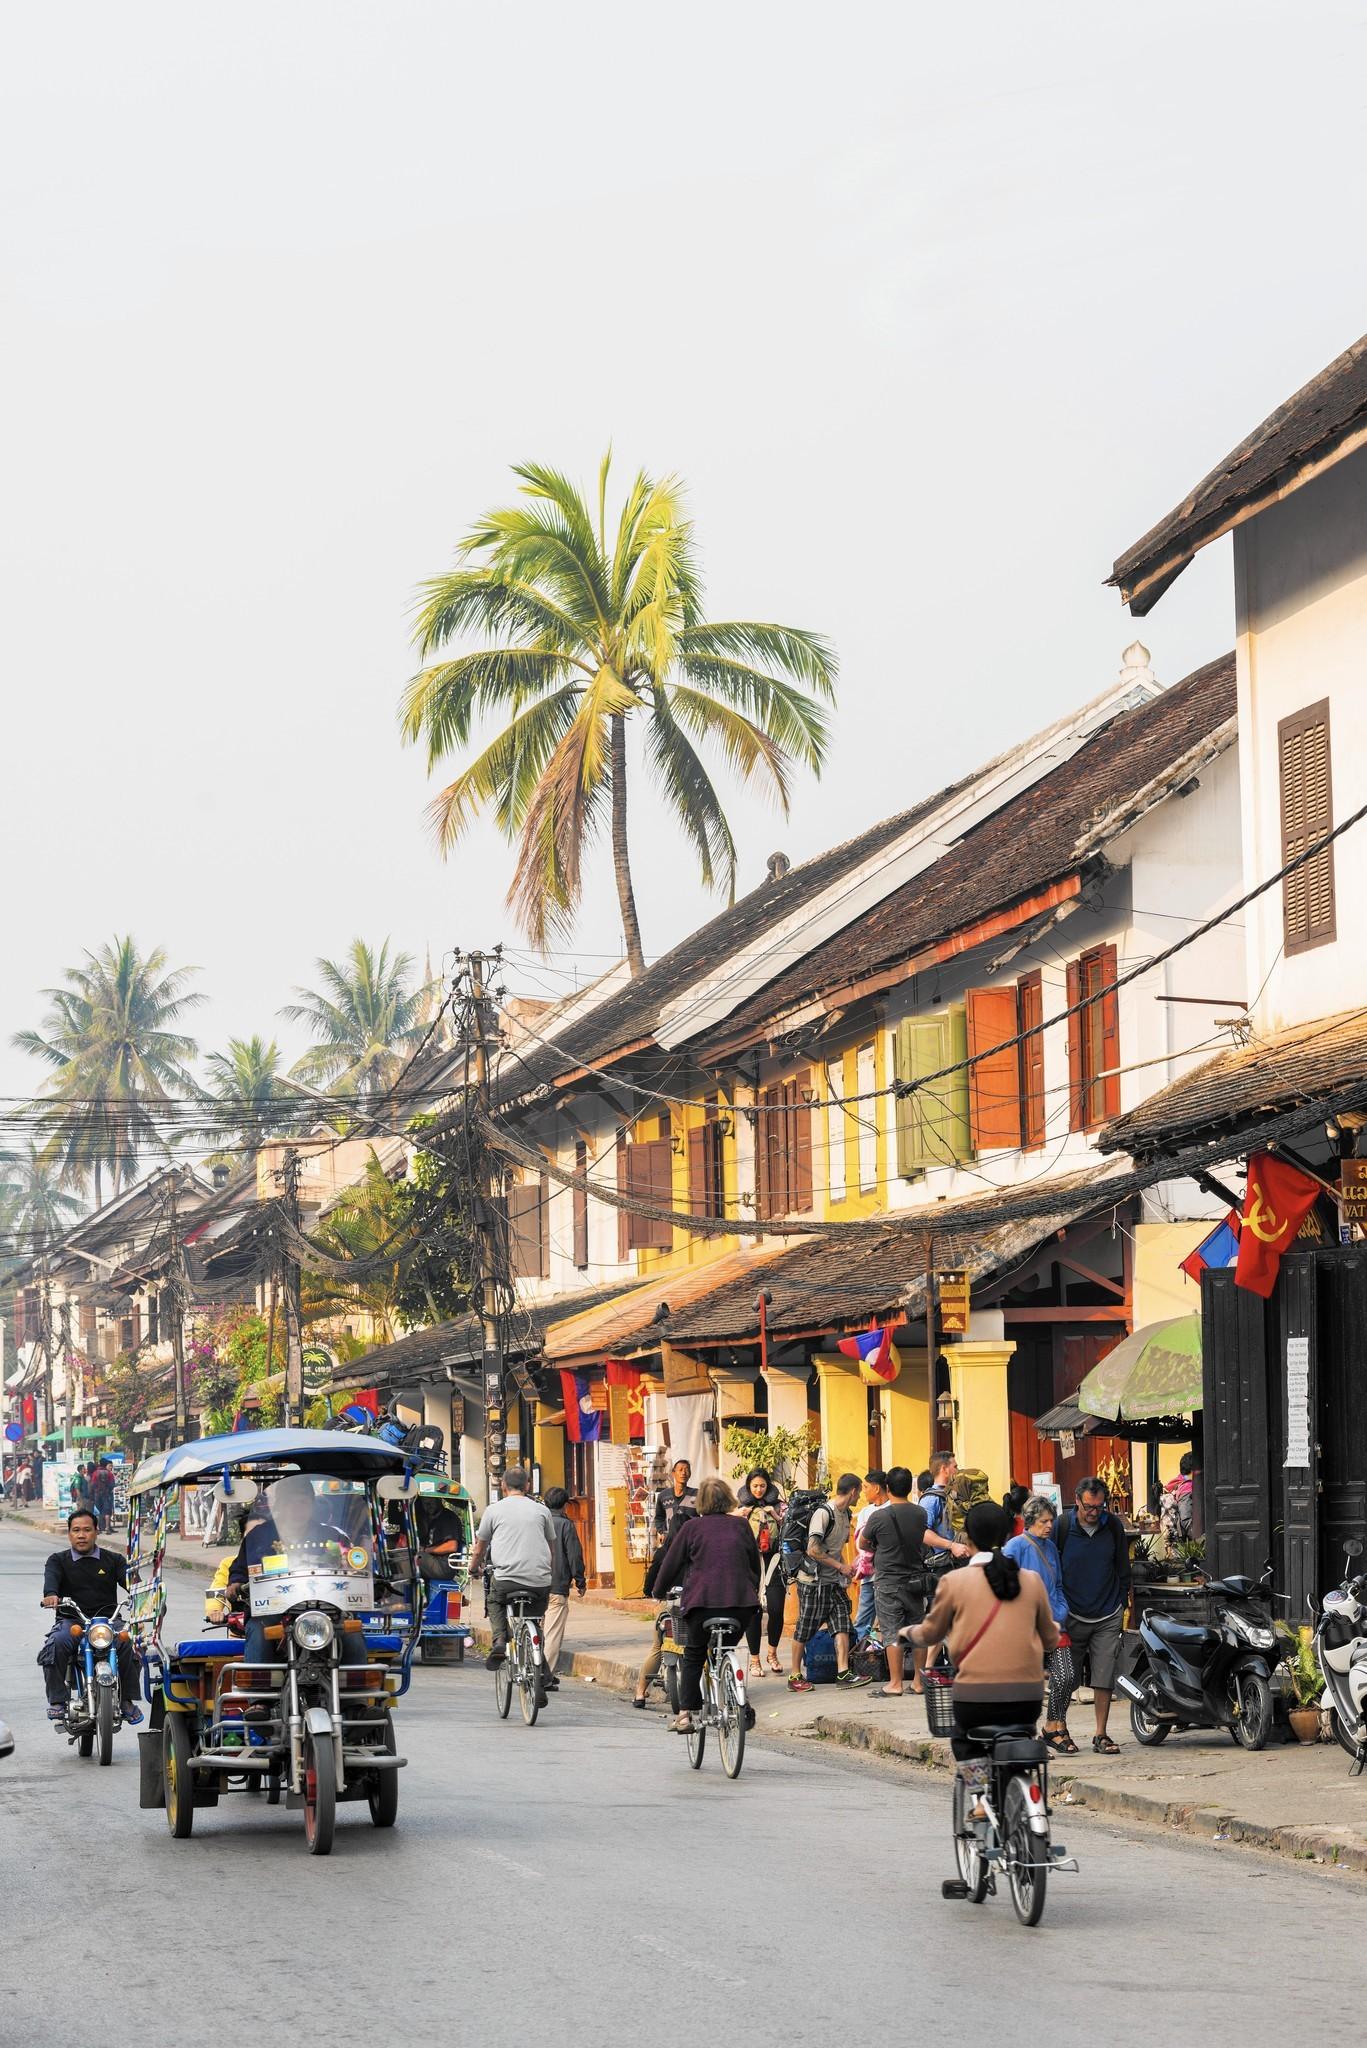 Shootings in Laos prompt travel alert